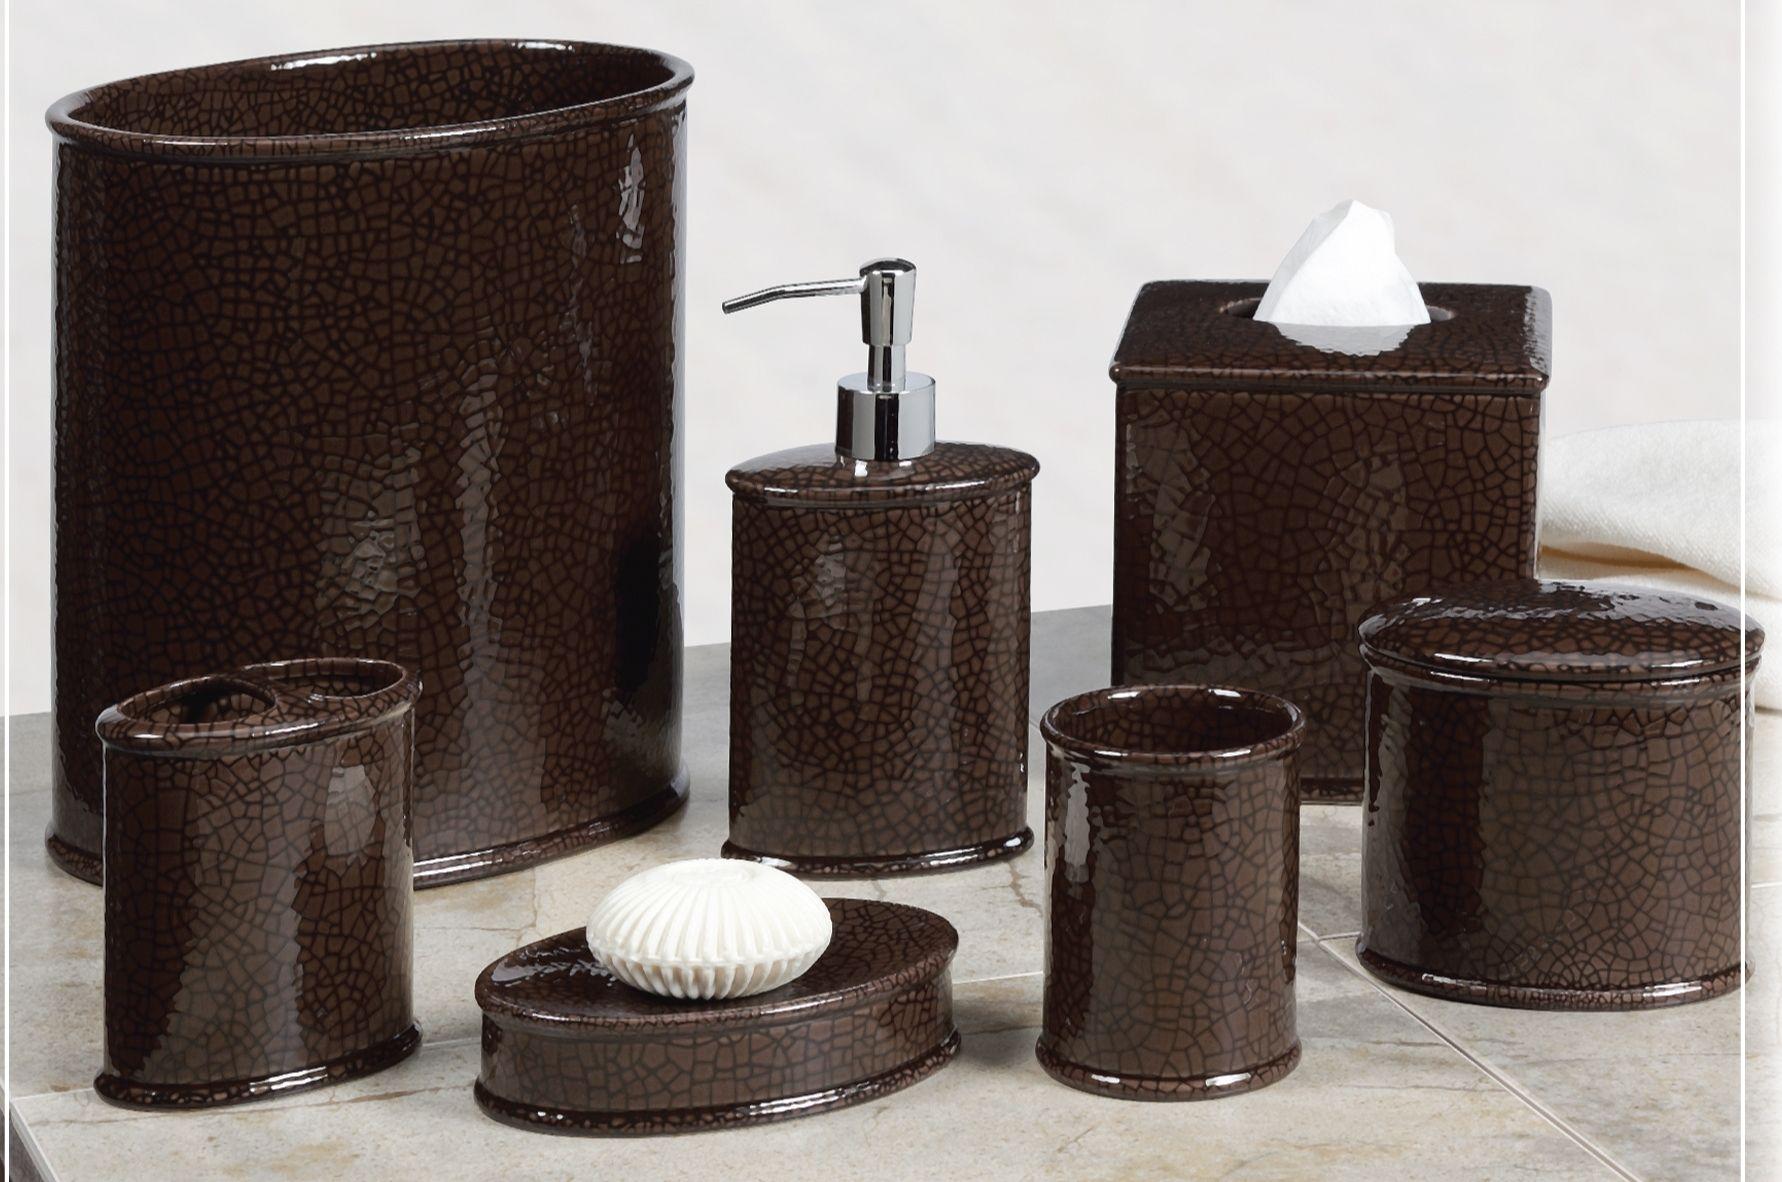 Creative Bath Crackle Chocolate Brown Ceramic Accessory Set 20